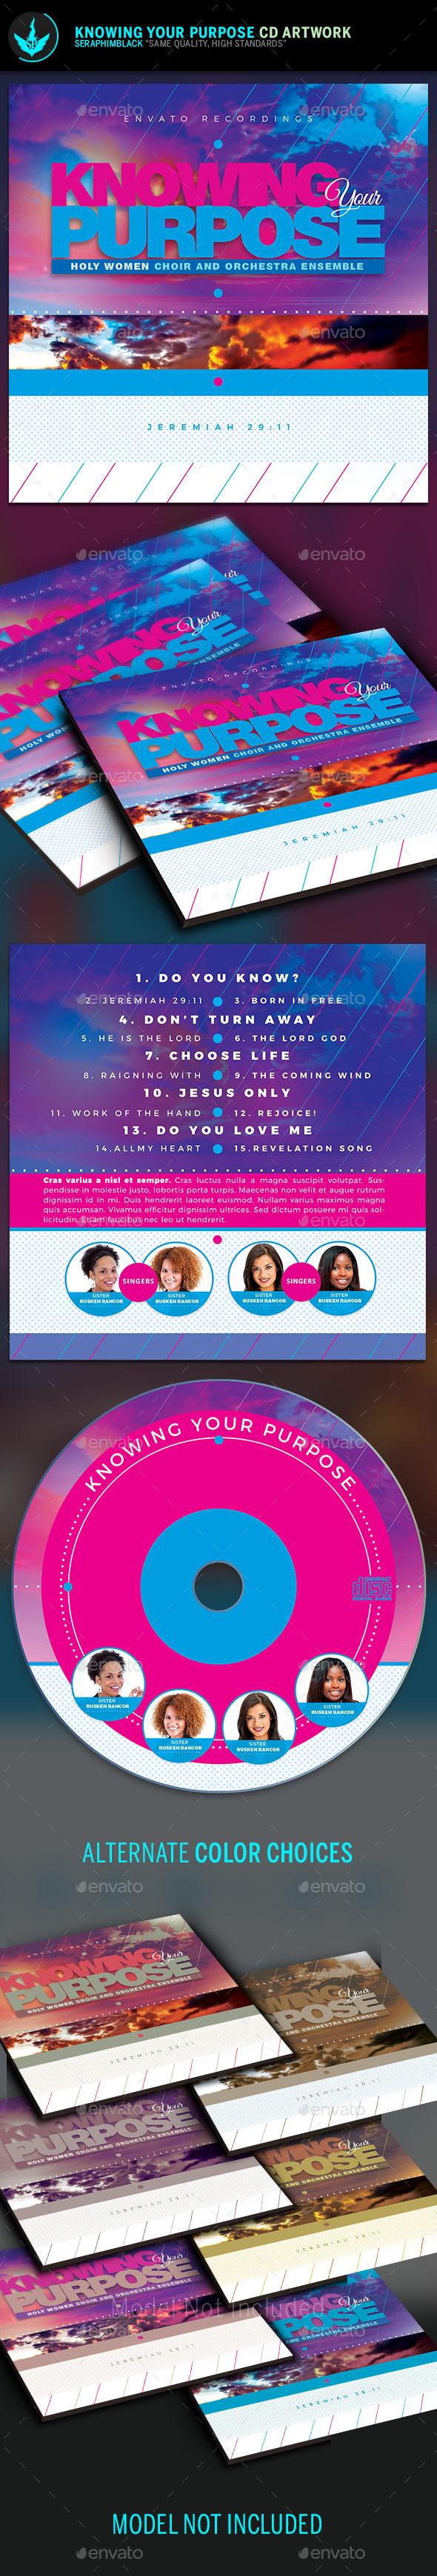 Knowing Your Purpose CD Artwork Template - CD & DVD Artwork Print Templates